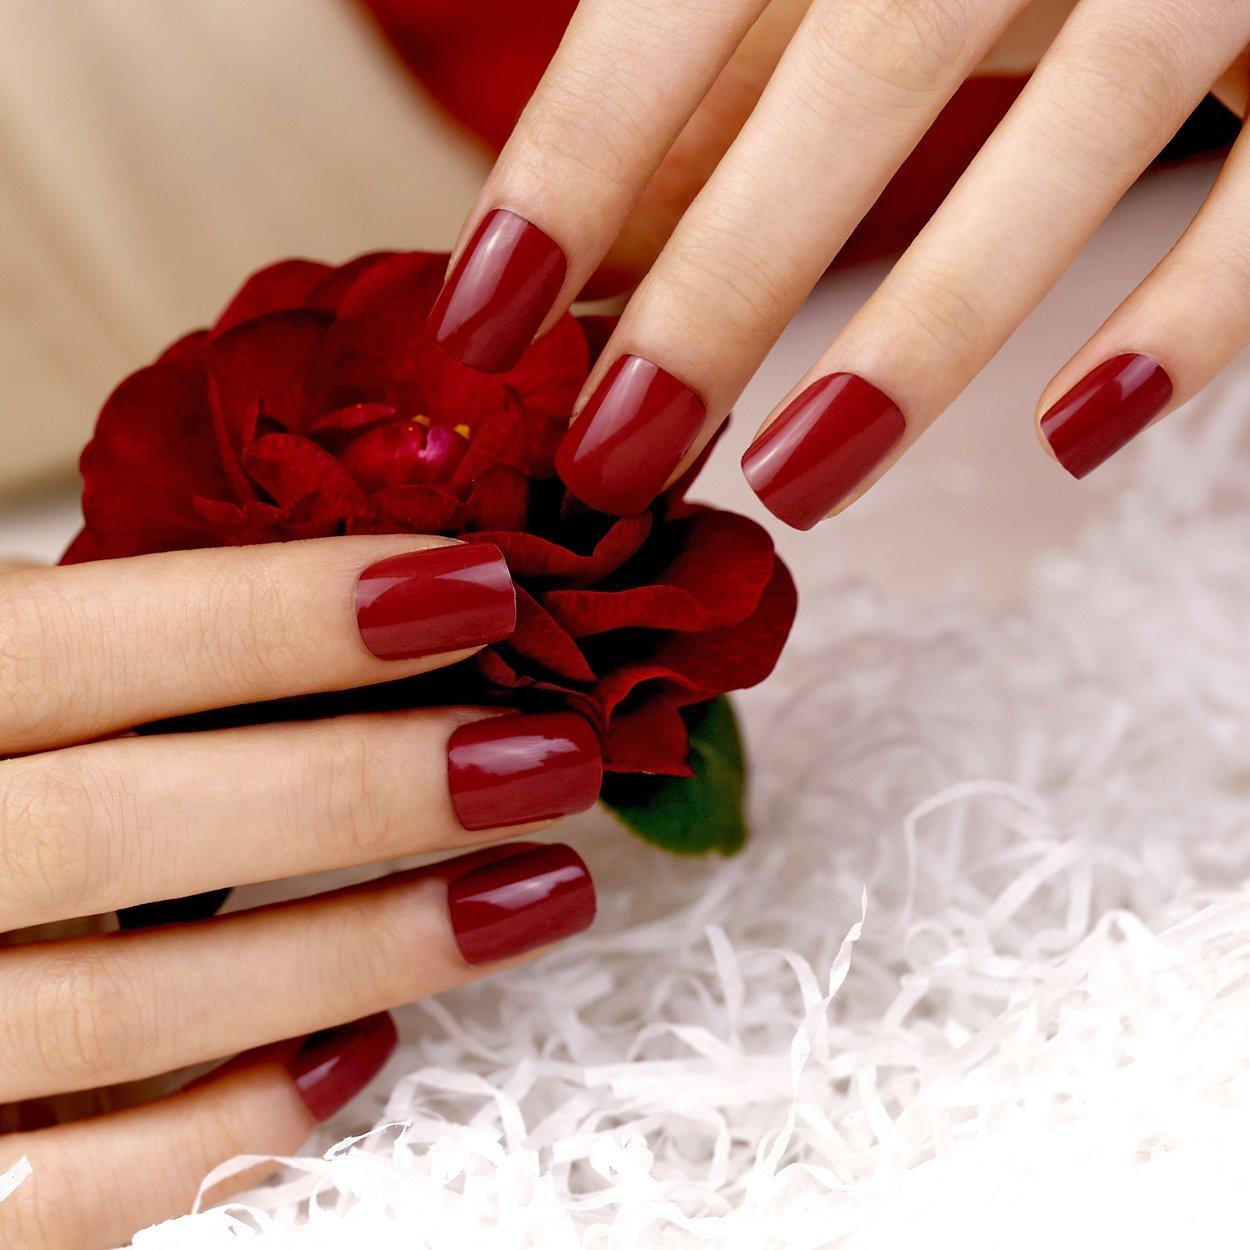 Buy ArtPlus 24pcs Burgundy False Nails French Manicure Full Cover ...